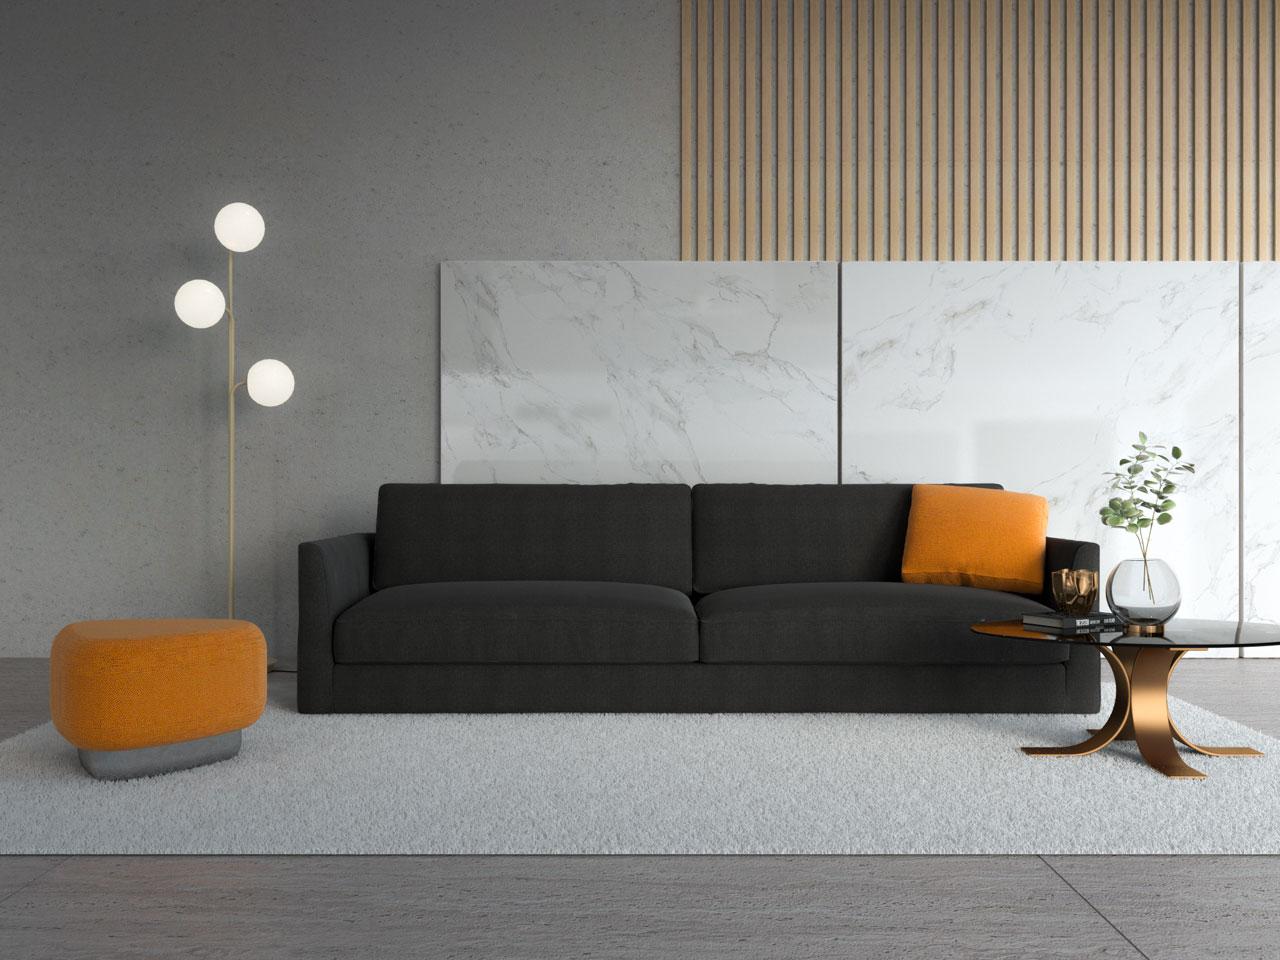 Black sofa with orange ottoman